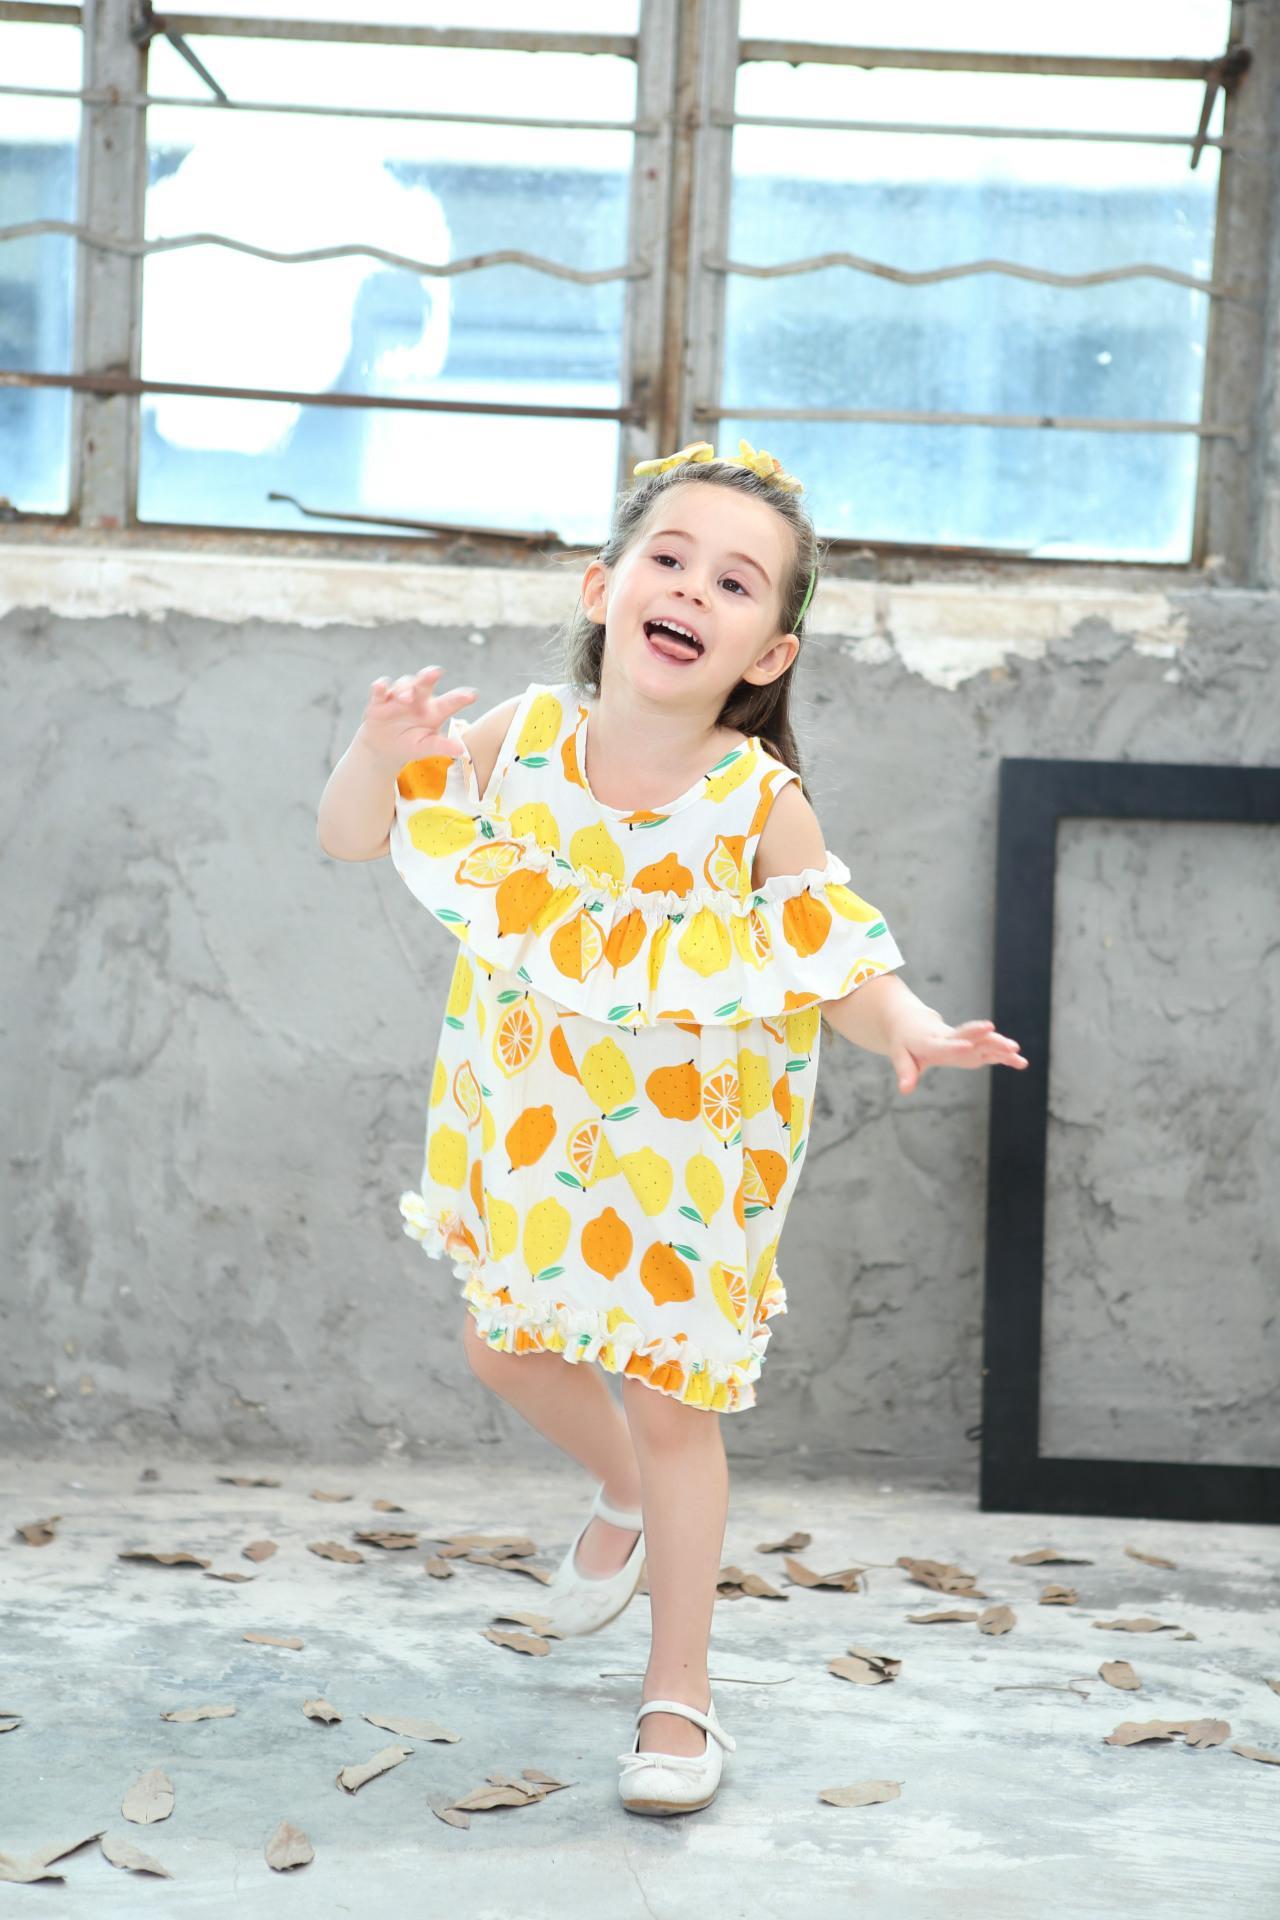 Lemon Printd Girls Dress 2018 New Summer Fashion Children Princess Dress Kids Children Clothes For 2 3 4 5 6 7 8 Years 1